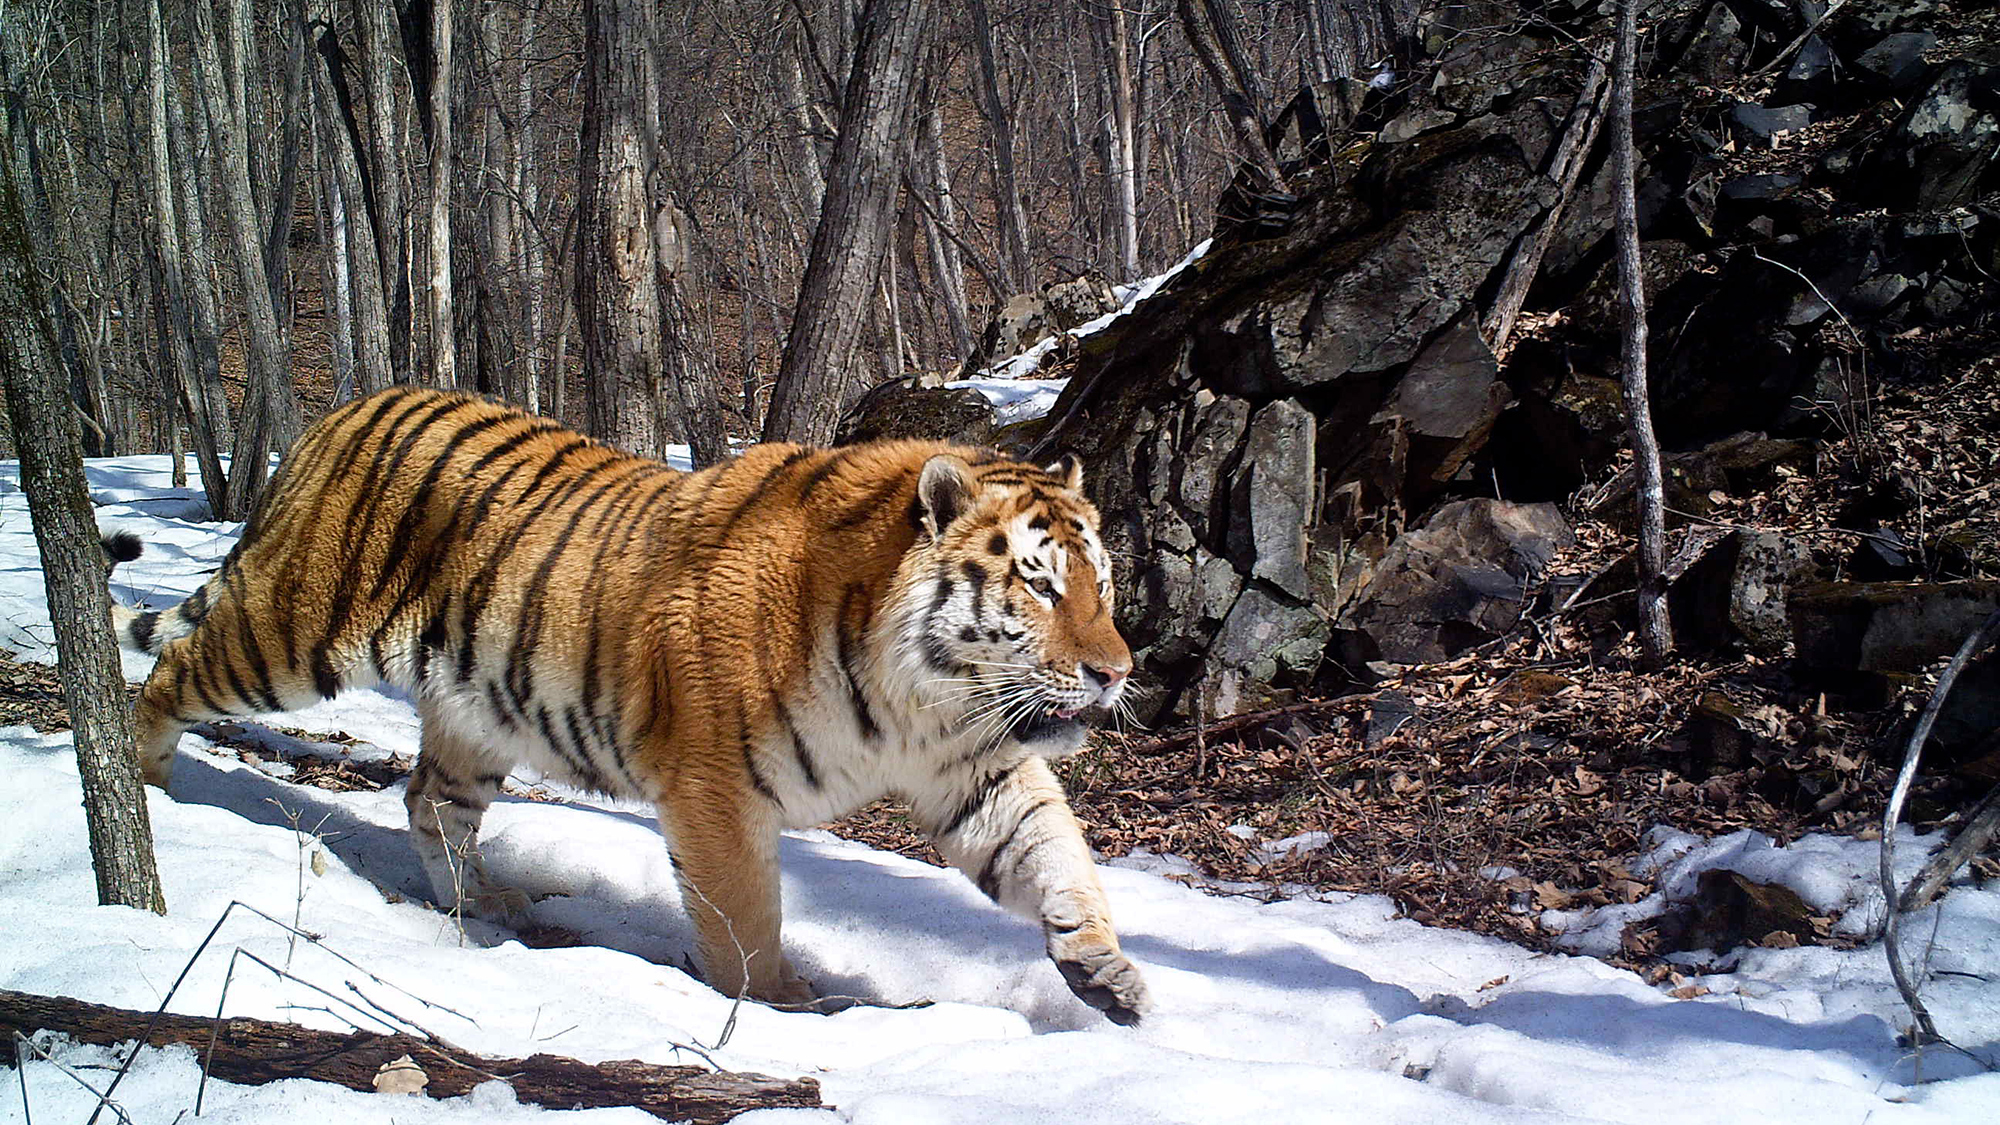 Baby siberian tiger wallpaper - photo#25